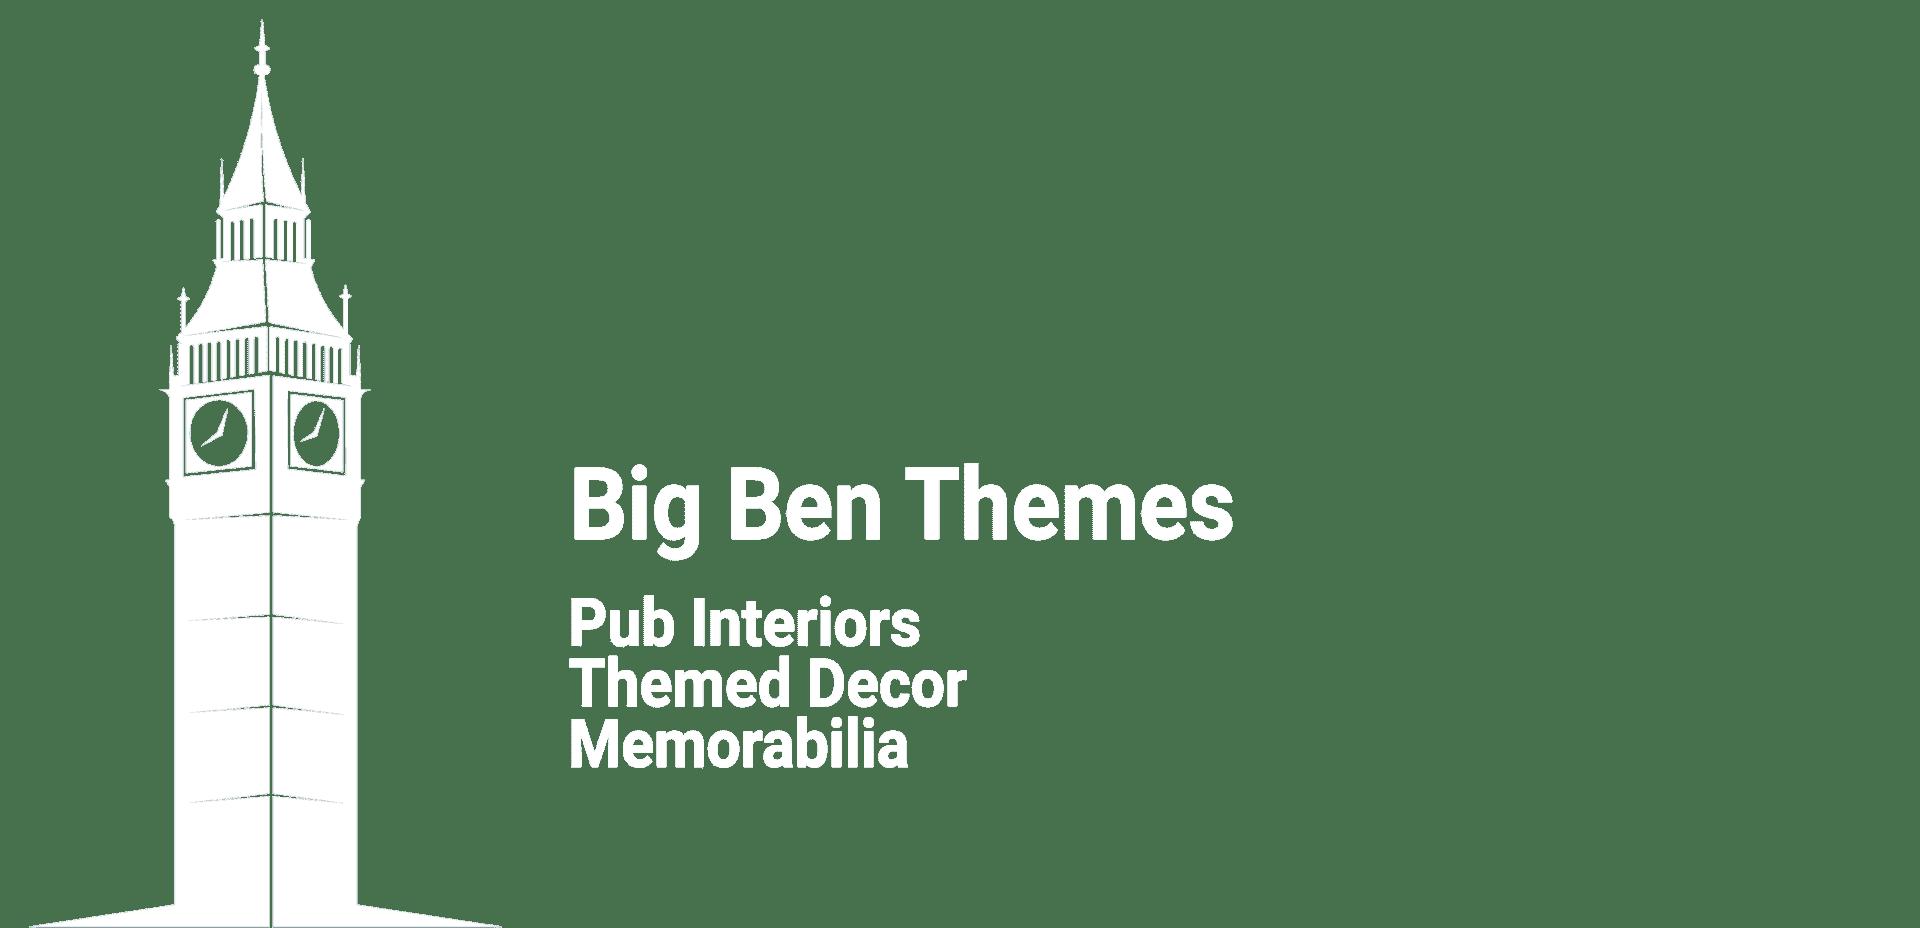 Big Ben Themes